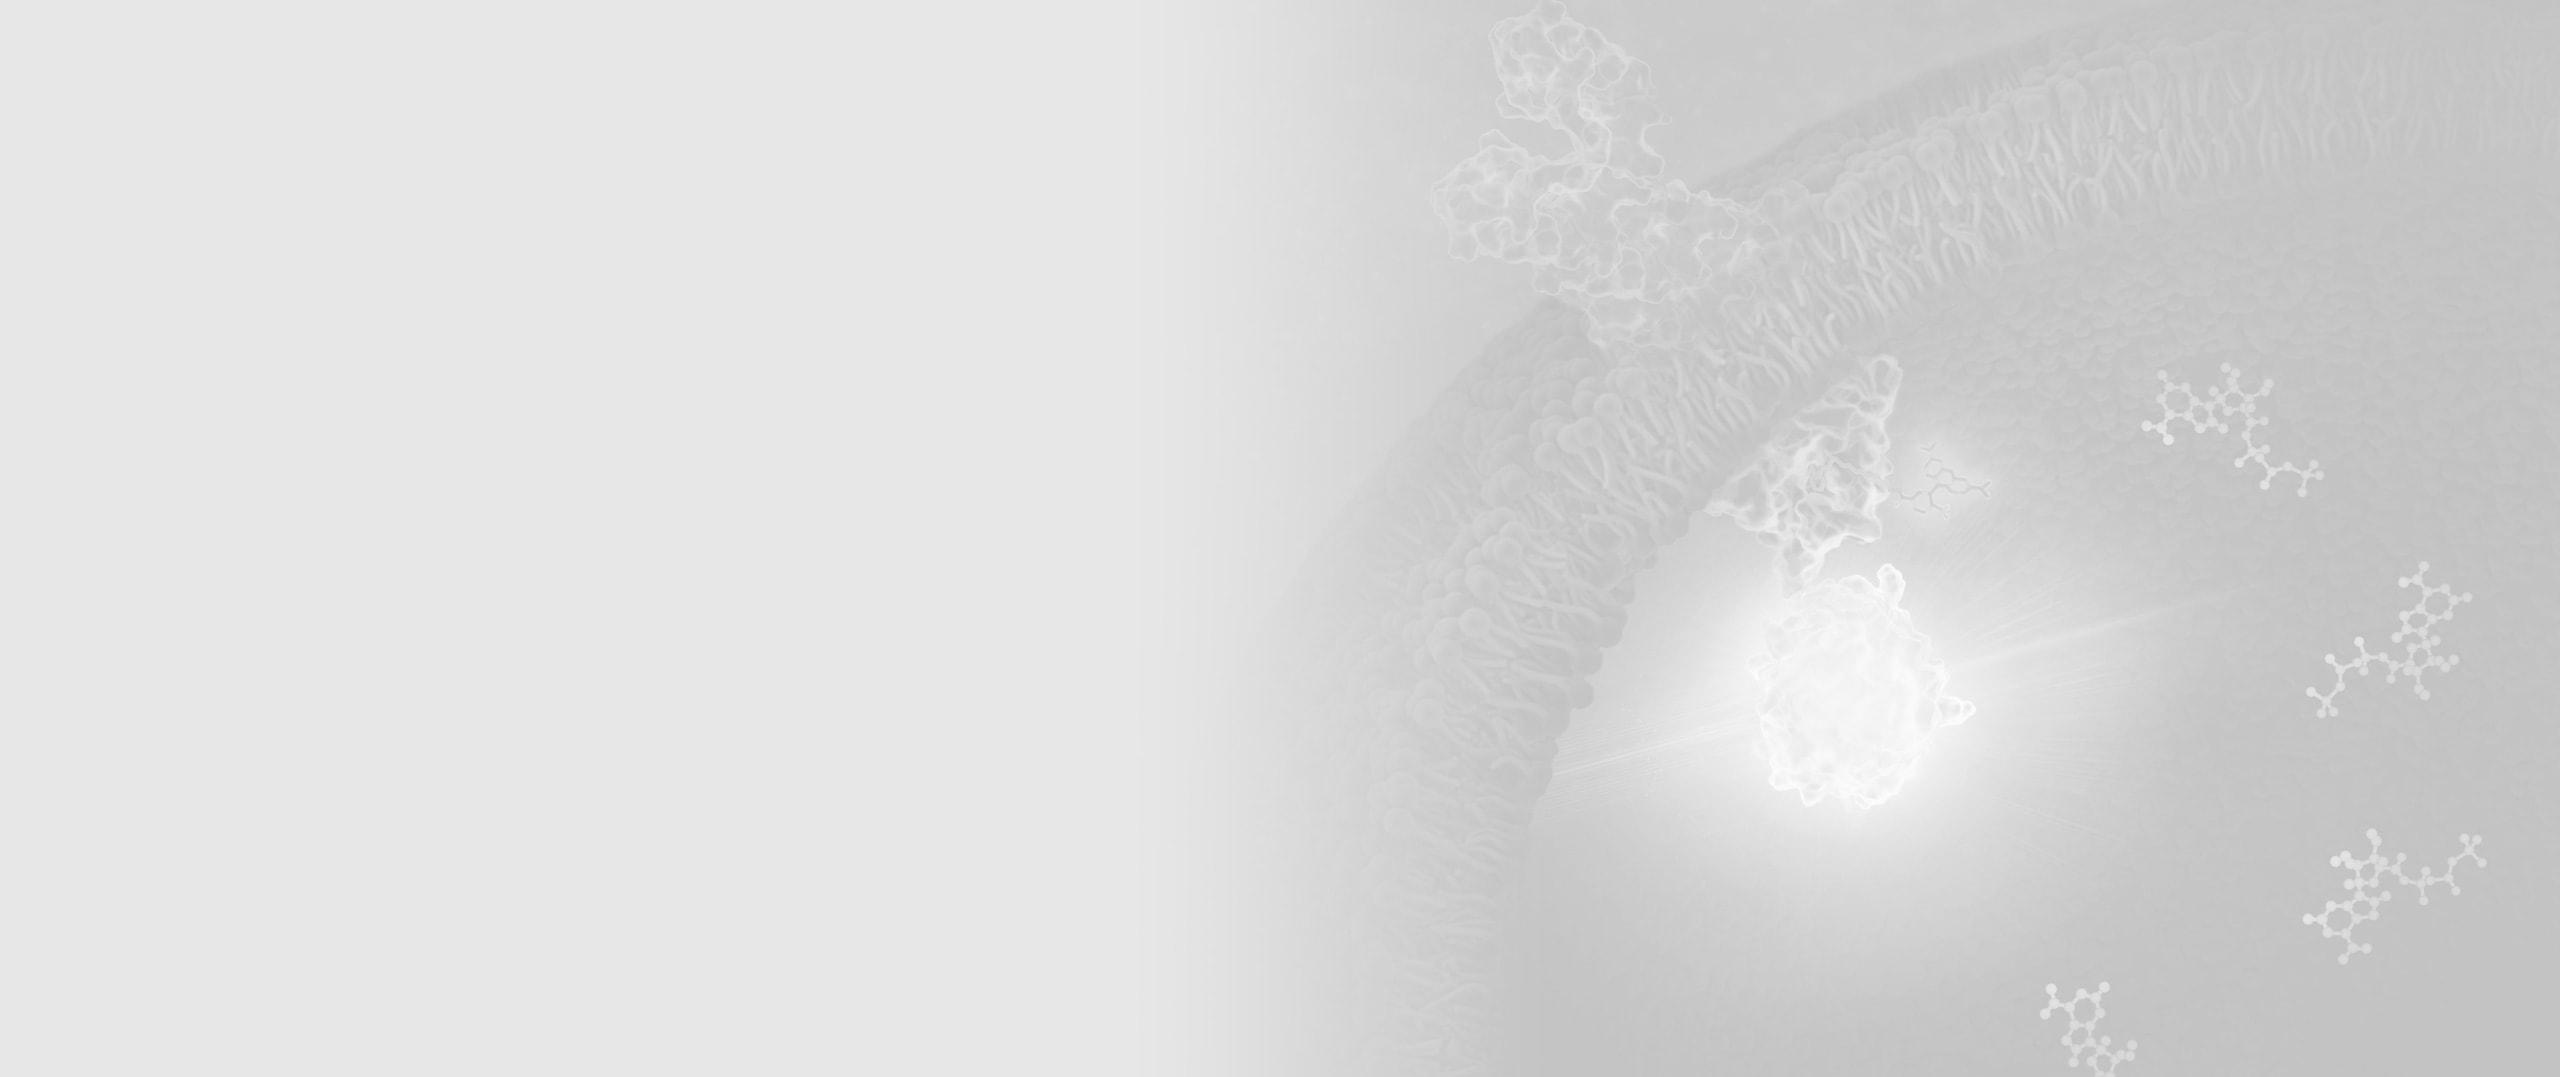 36566039-NanoBRET-TE-Kinases-Overview-Image